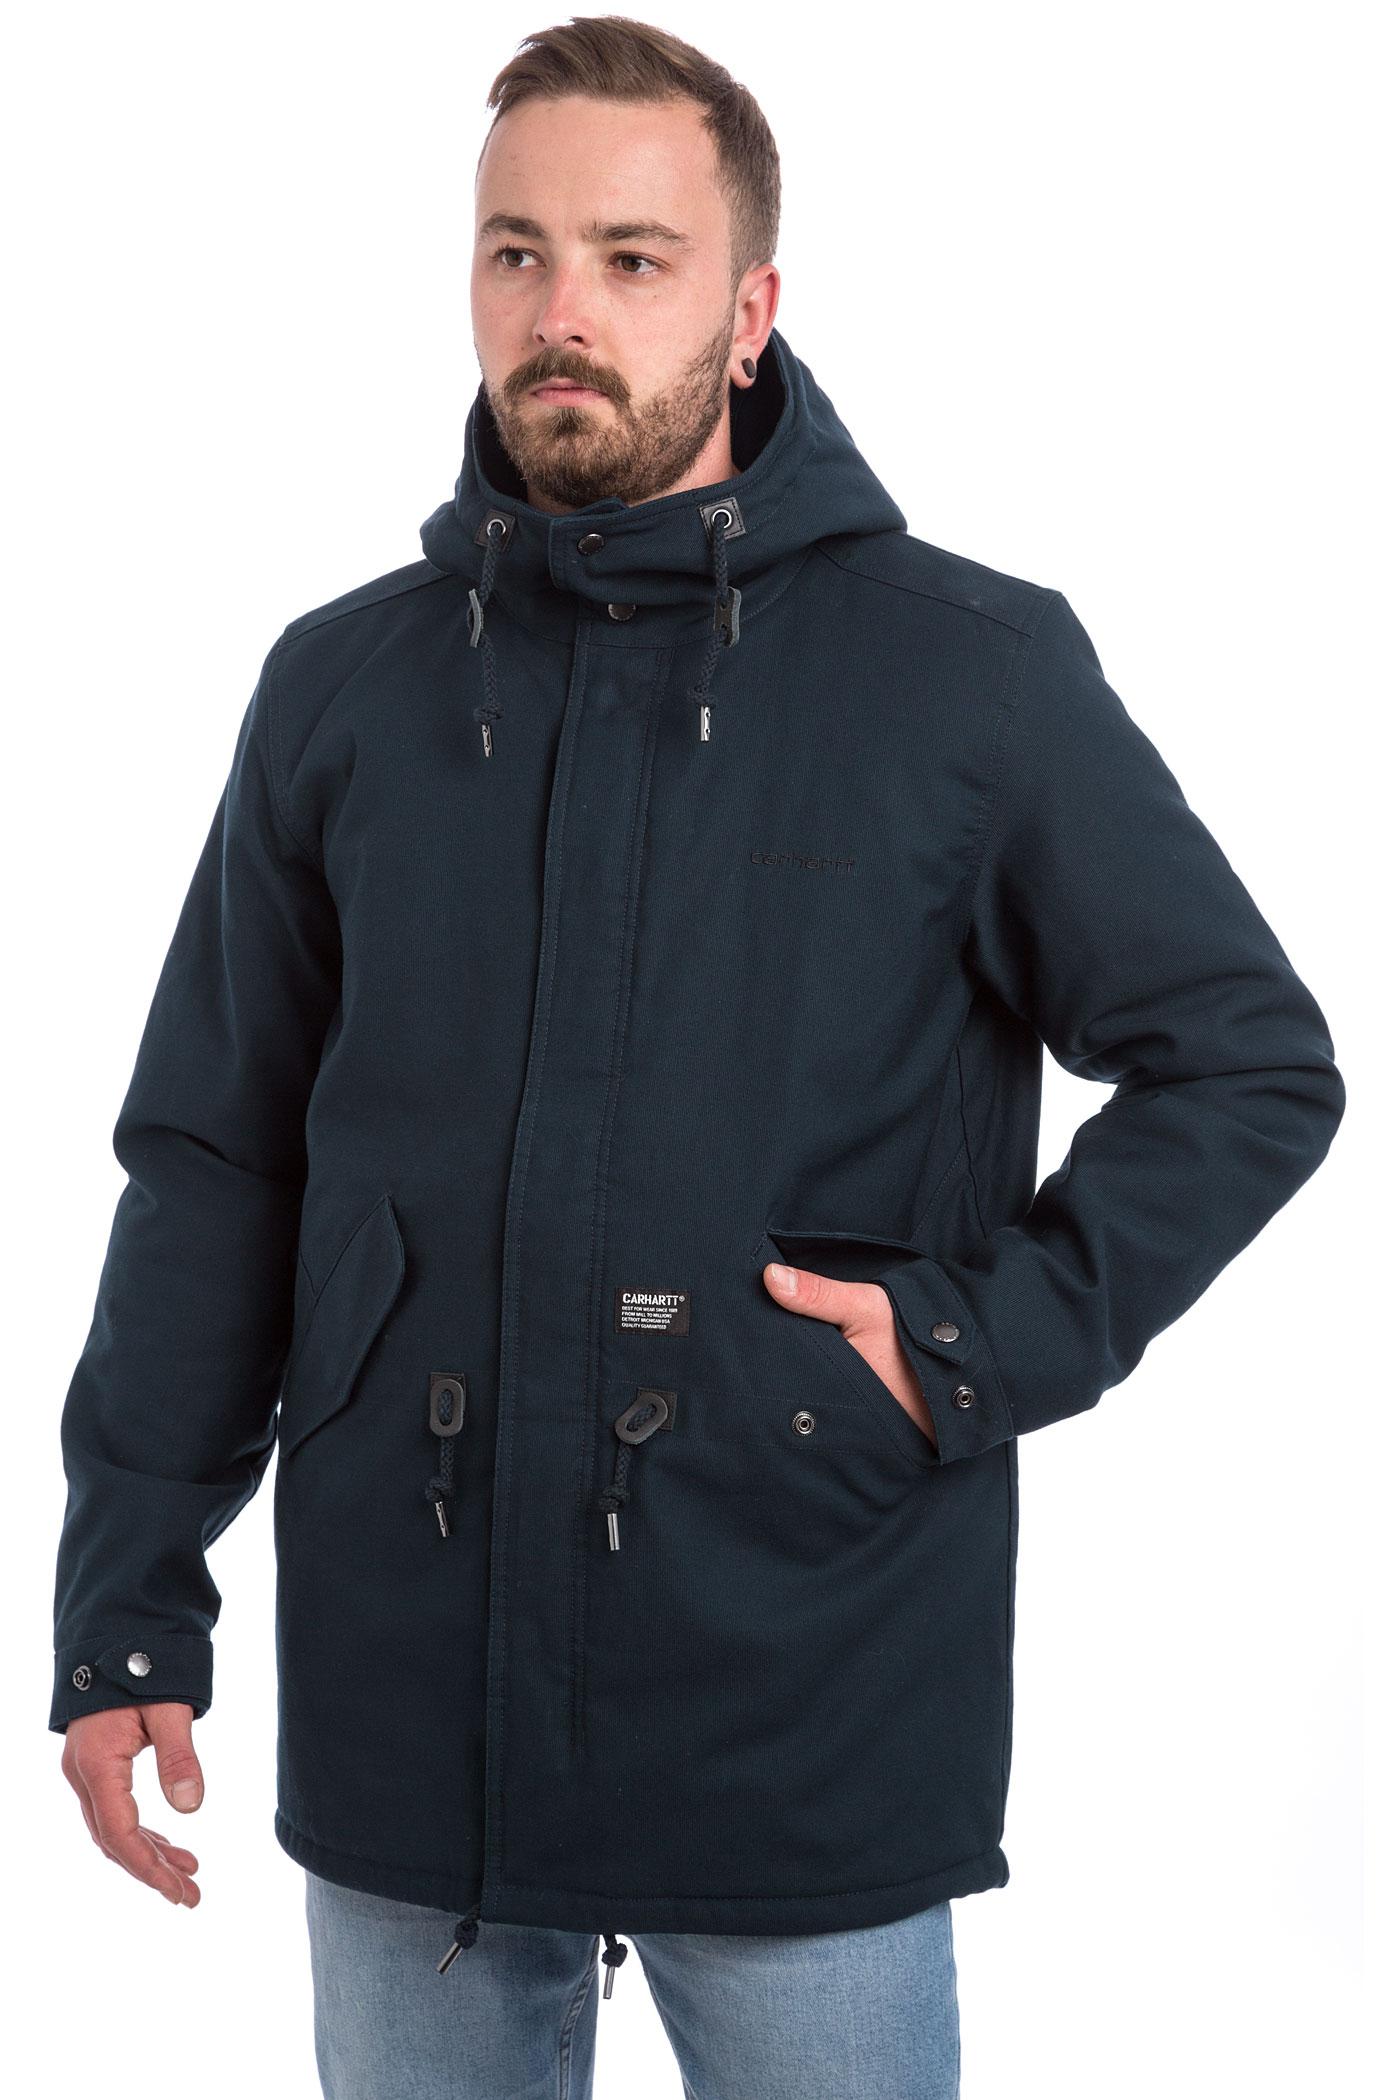 carhartt wip clash parka jacket navy buy at skatedeluxe. Black Bedroom Furniture Sets. Home Design Ideas